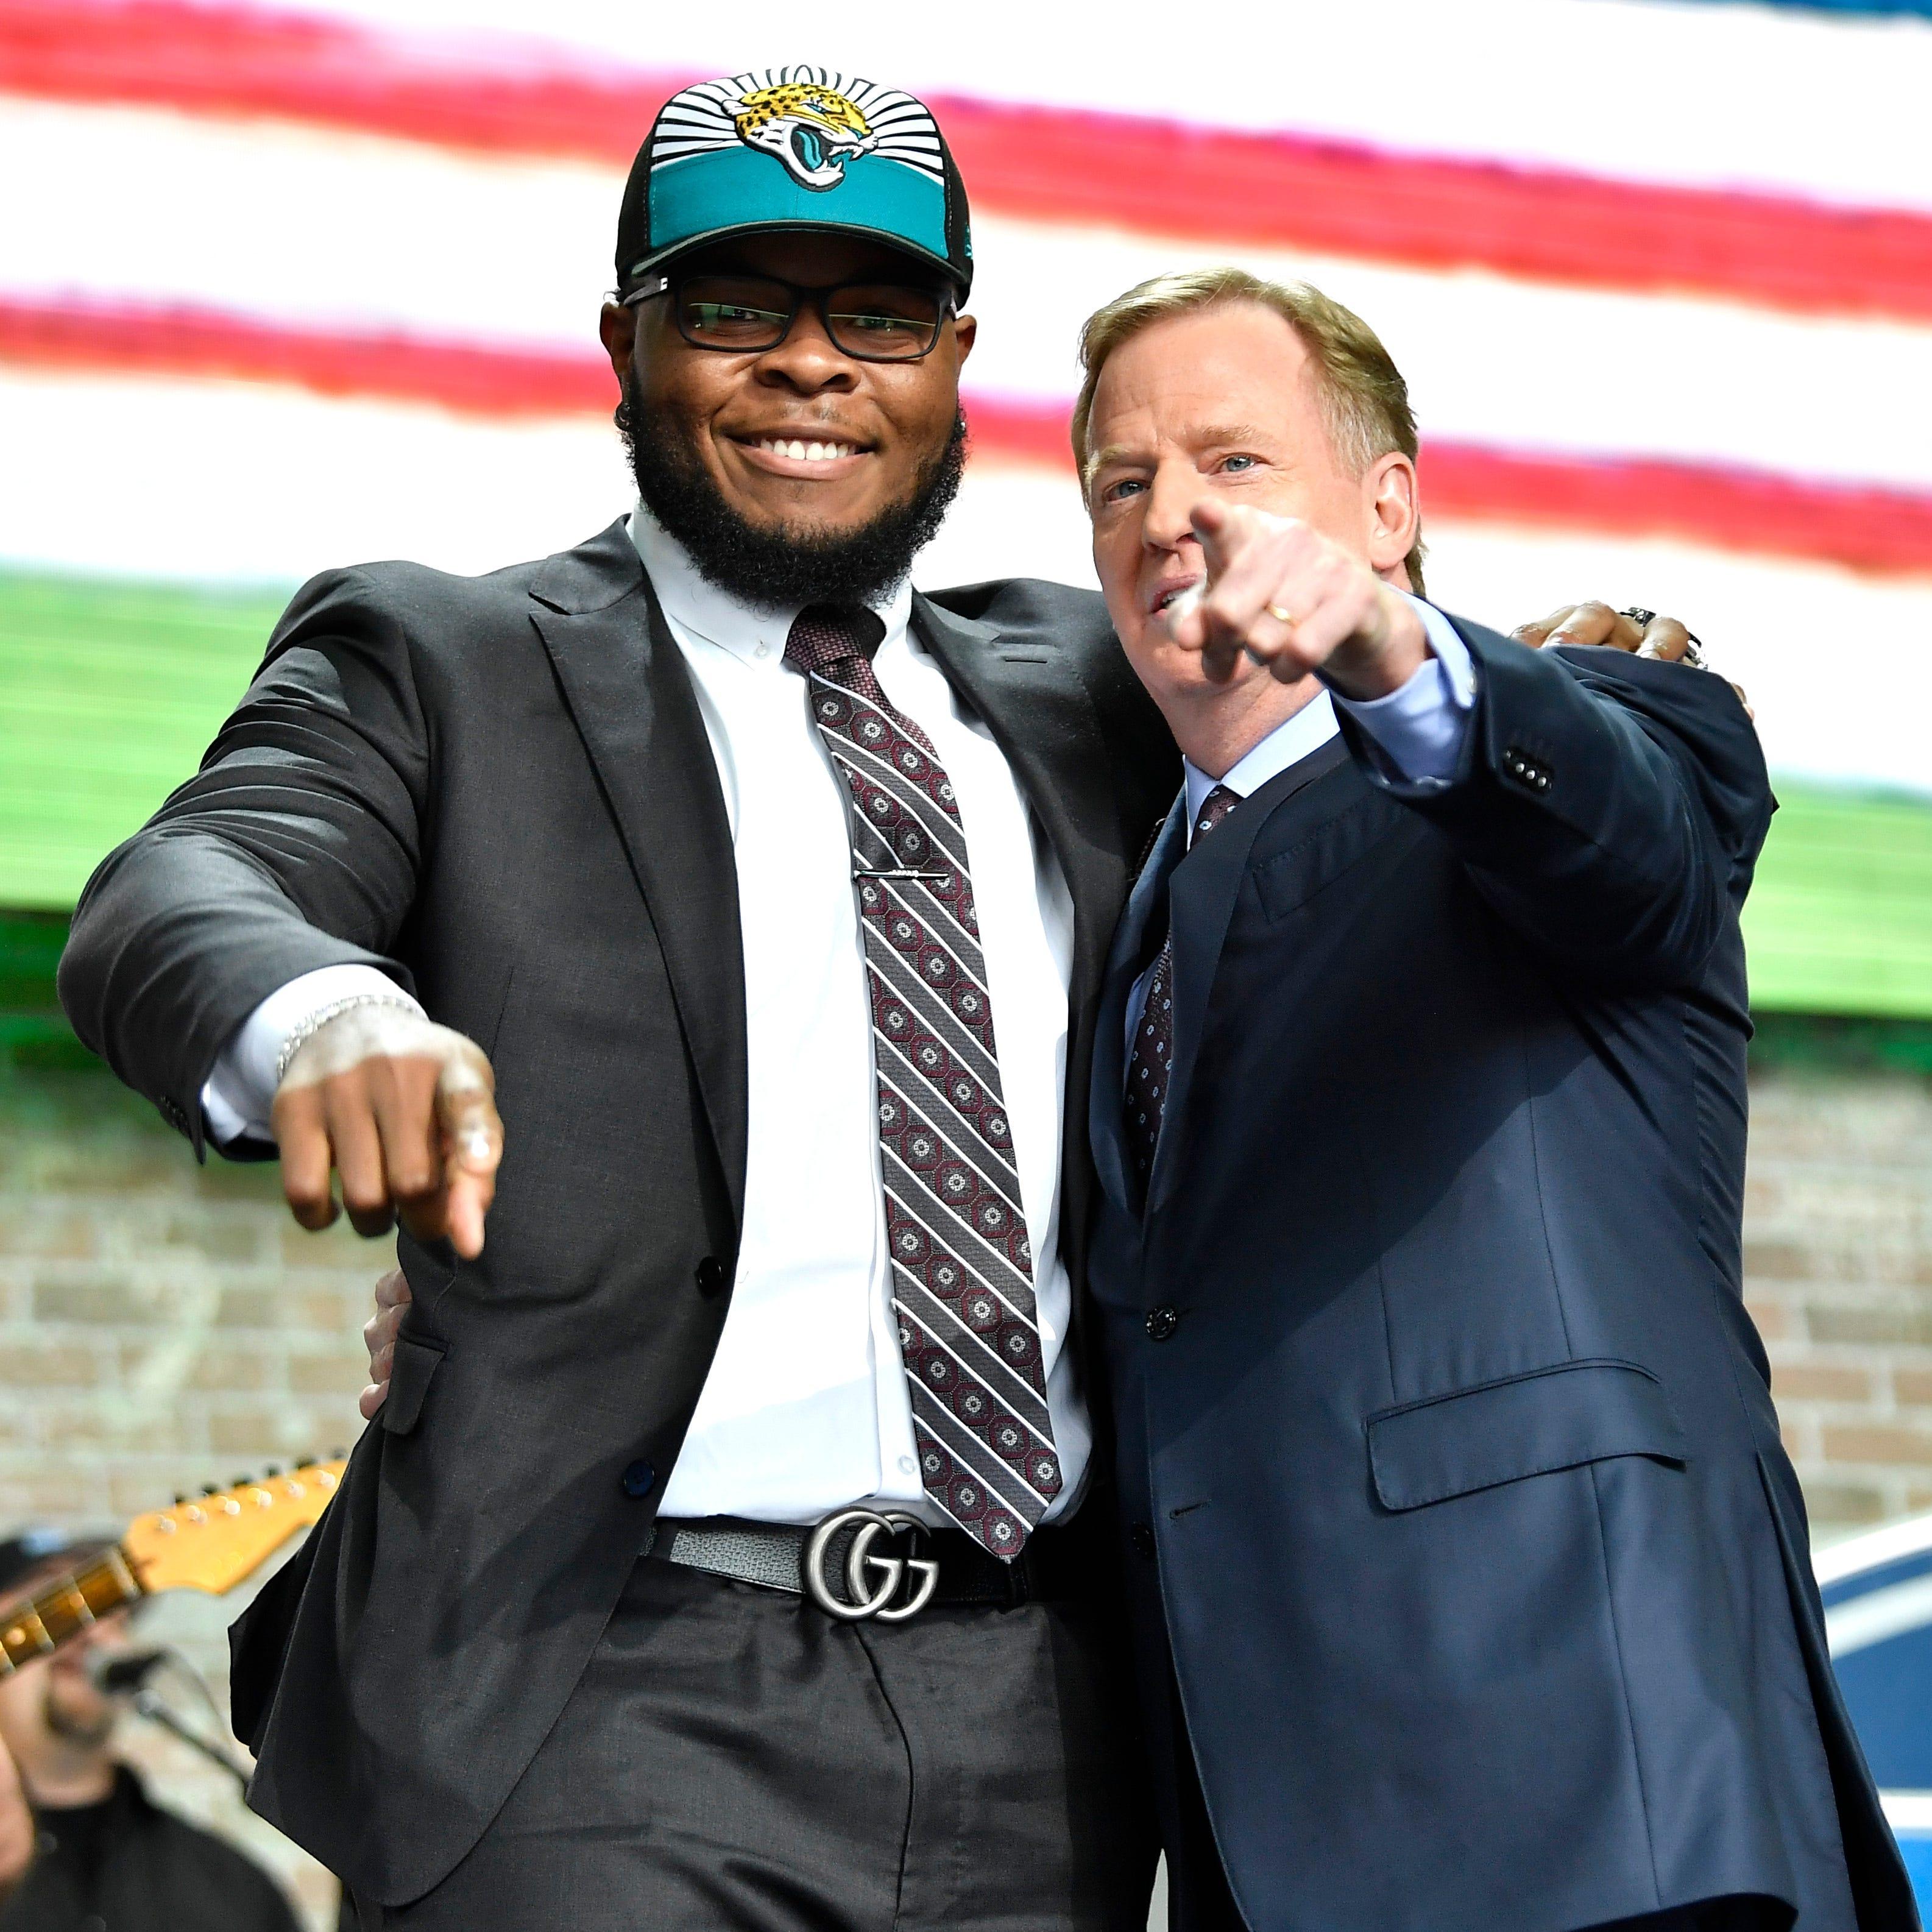 2019 NFL Draft: Jags claim Cocoa High's Jawaan Taylor, Dean to Bucs